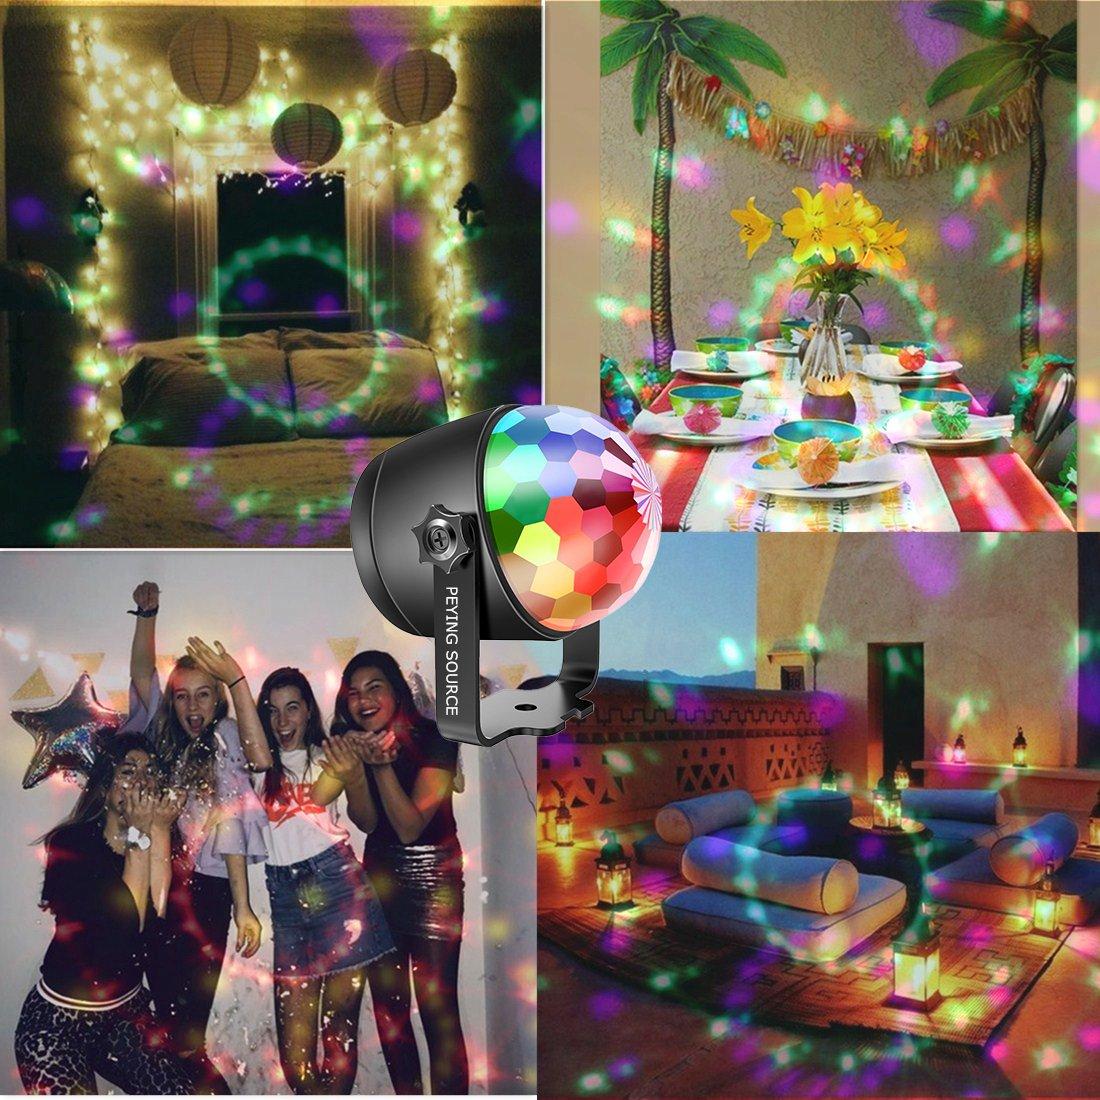 Luces Discoteca Bola Fiesta Escenario Mágica Lámpara Noche Luz 2 en 1 RVABPA 6W Colores para Disco Fiesta Bar Etapa Boda Habitación Decoración PEYING SOURCE (6 color)